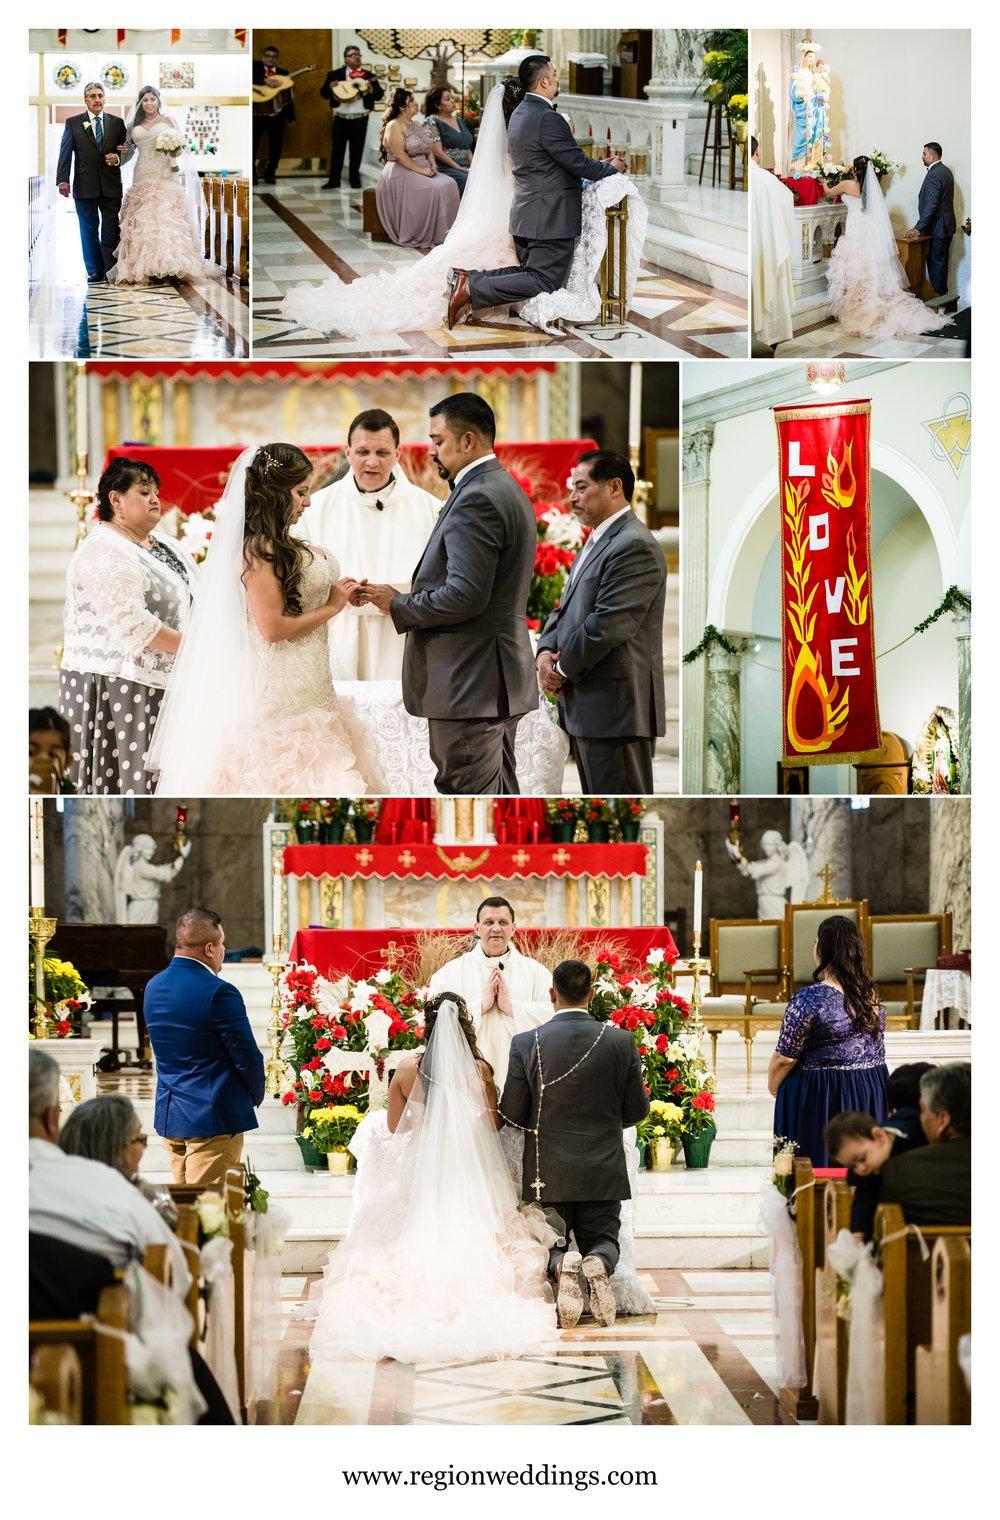 Catholic wedding ceremony at St. Anthony's in Chicago.